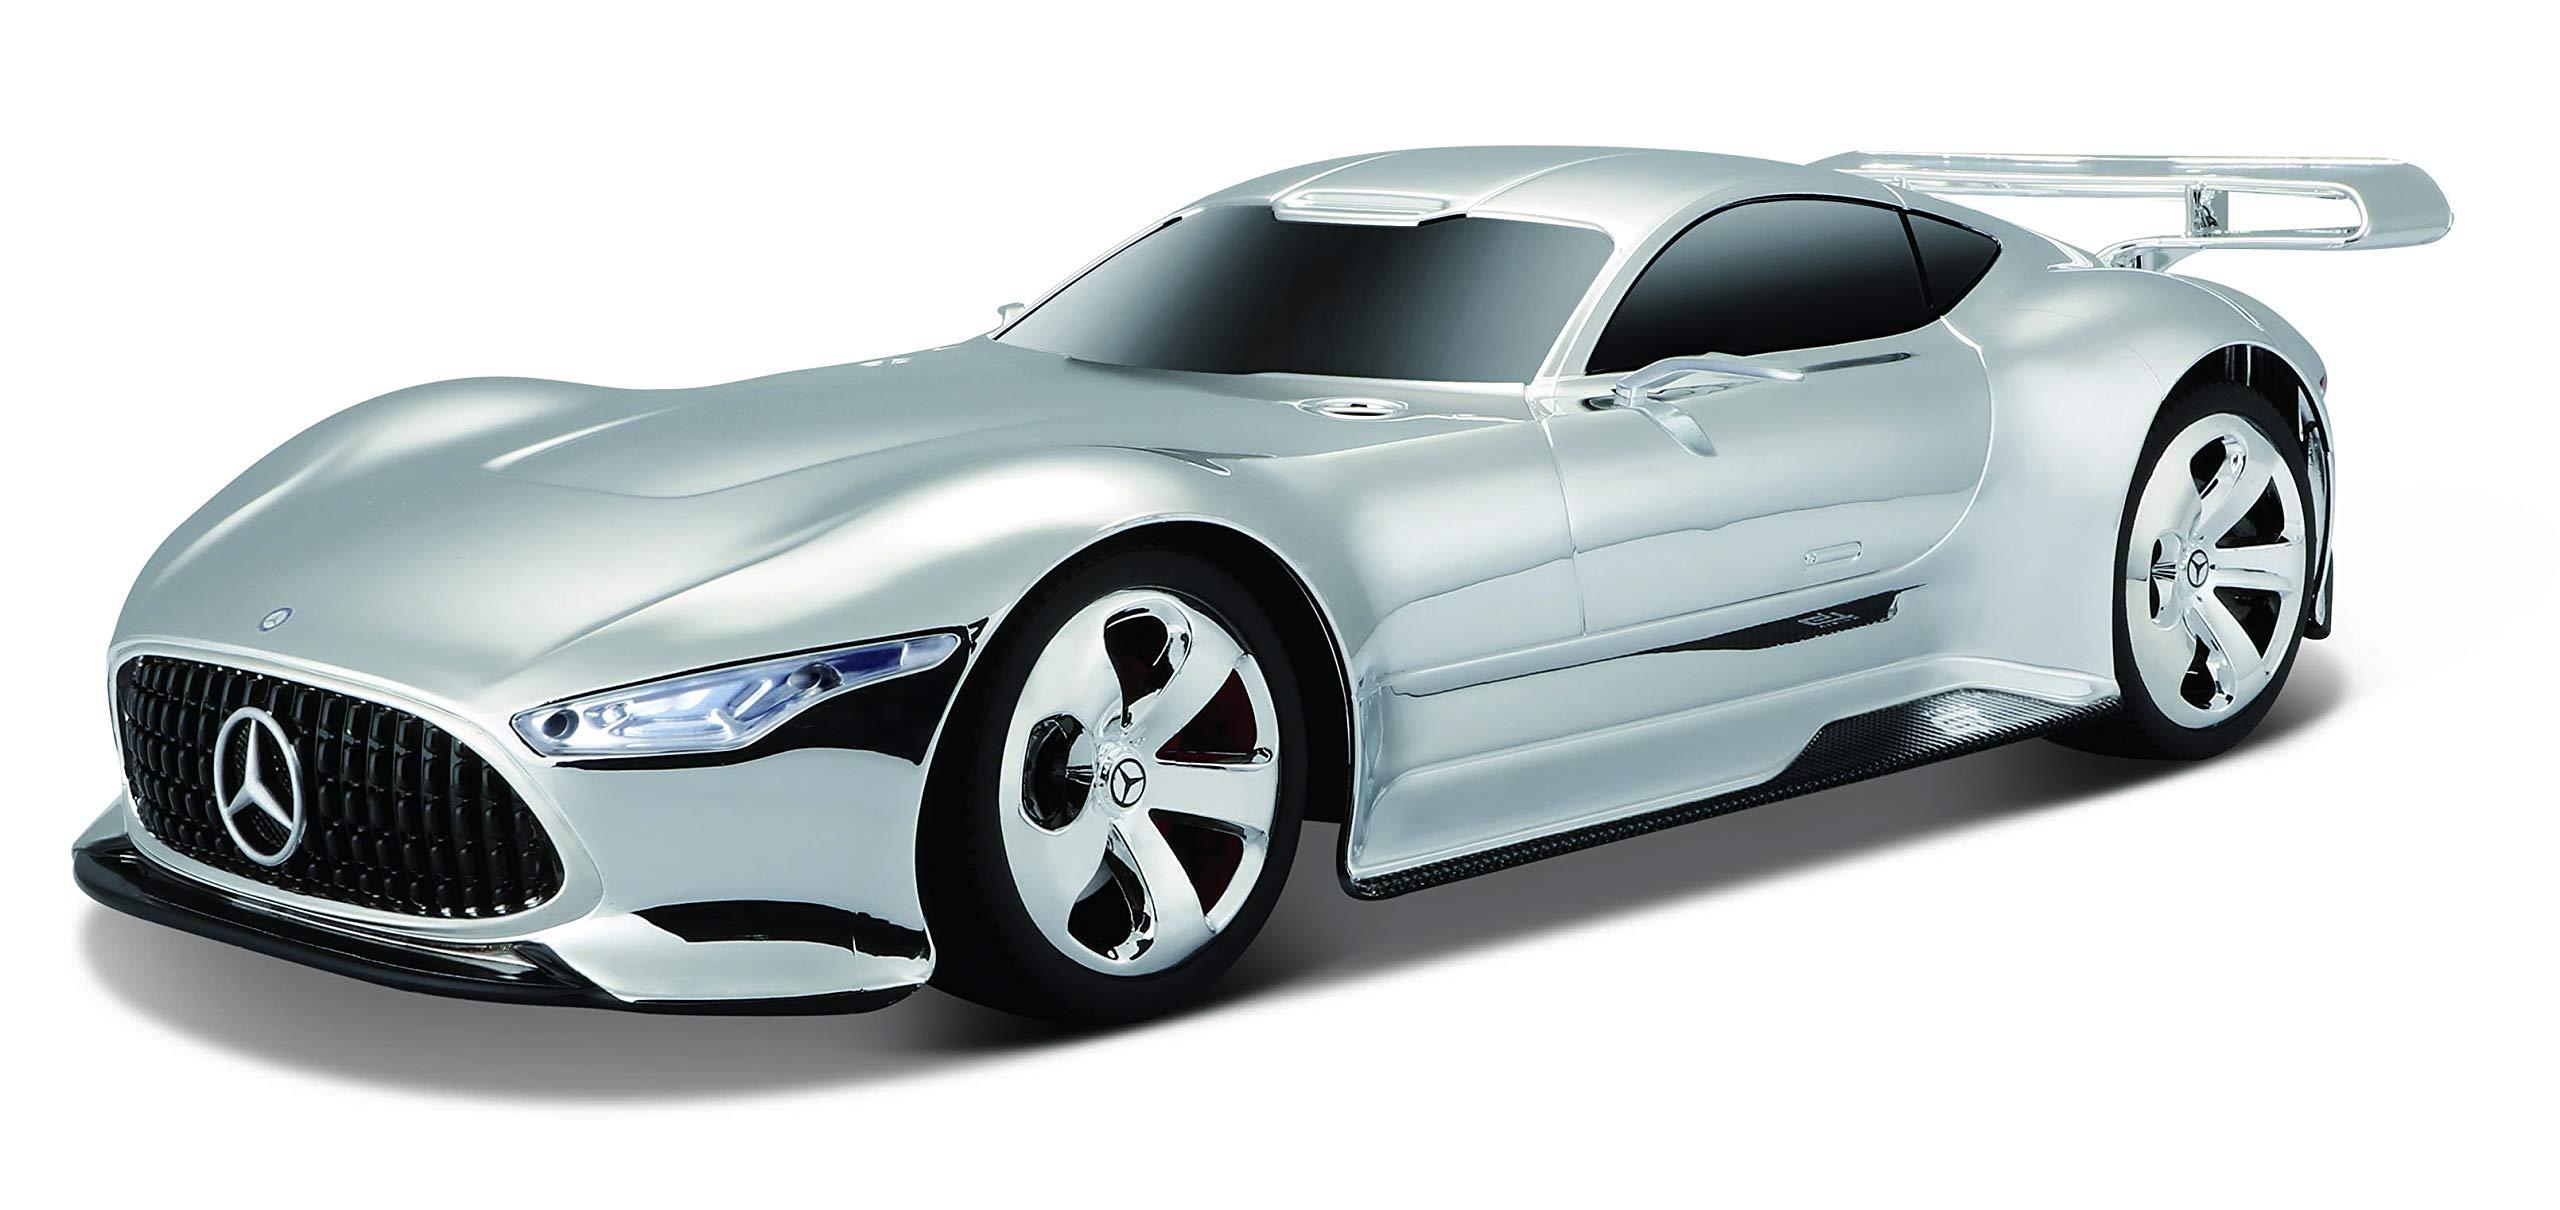 Tobar M82164 1:18 RC Mercedes Benz AMG Vision Gran Turismo, Multi